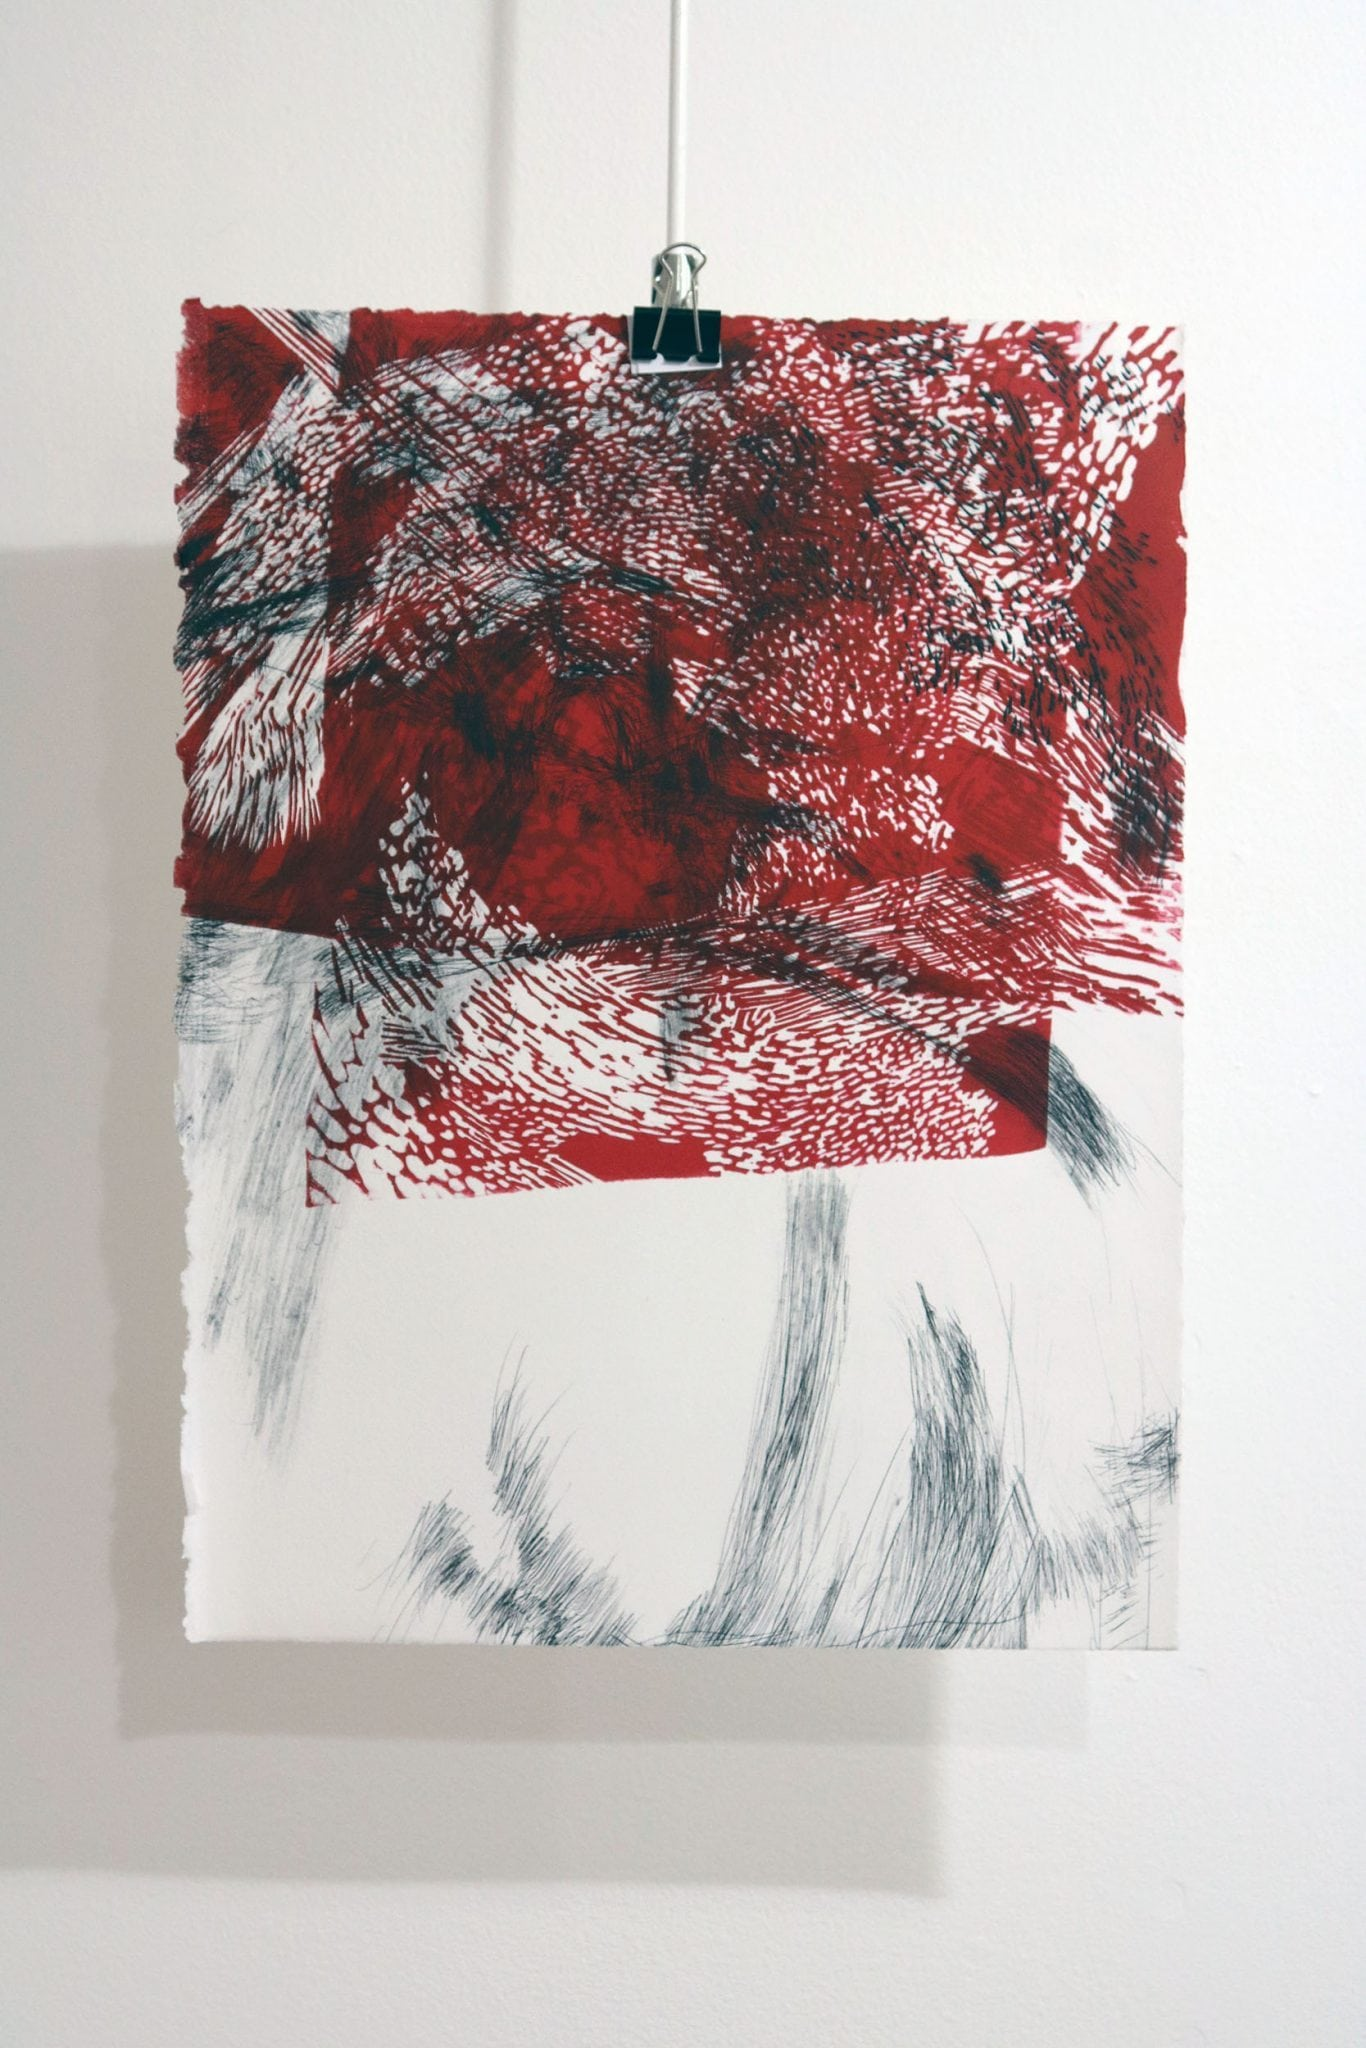 Homeward Printmaking Exhibition shown in BUMF Gallery